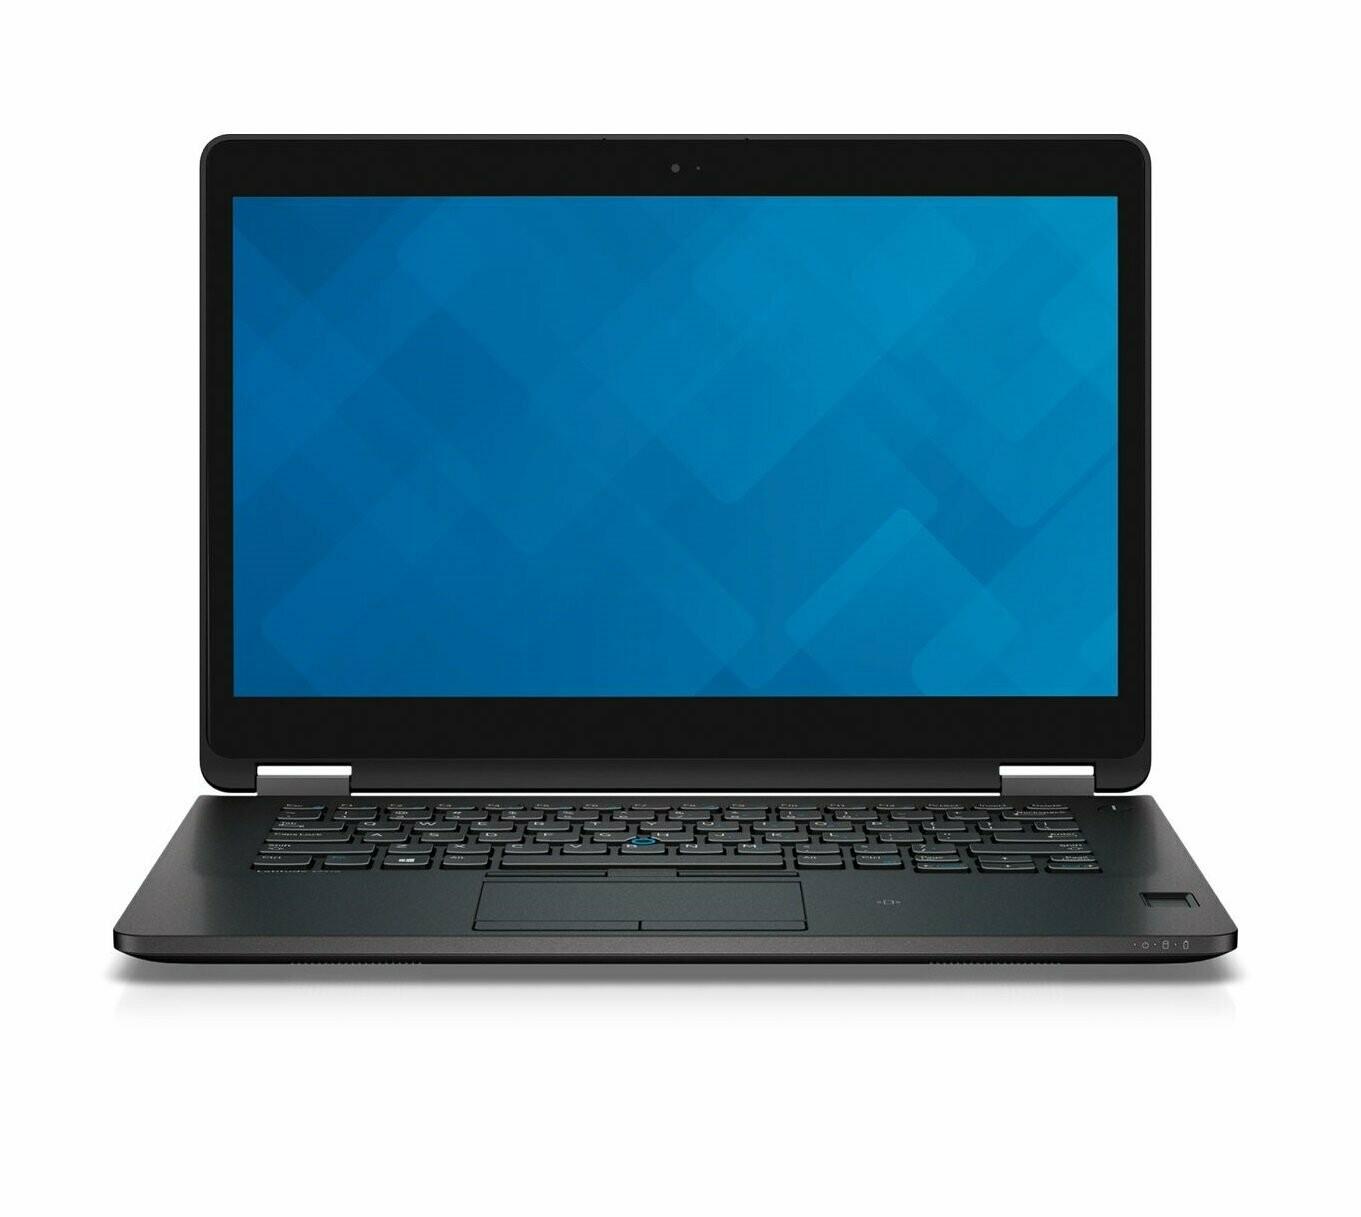 Dell Laltitude E7470 Premium Ultrabook With Touch Screen